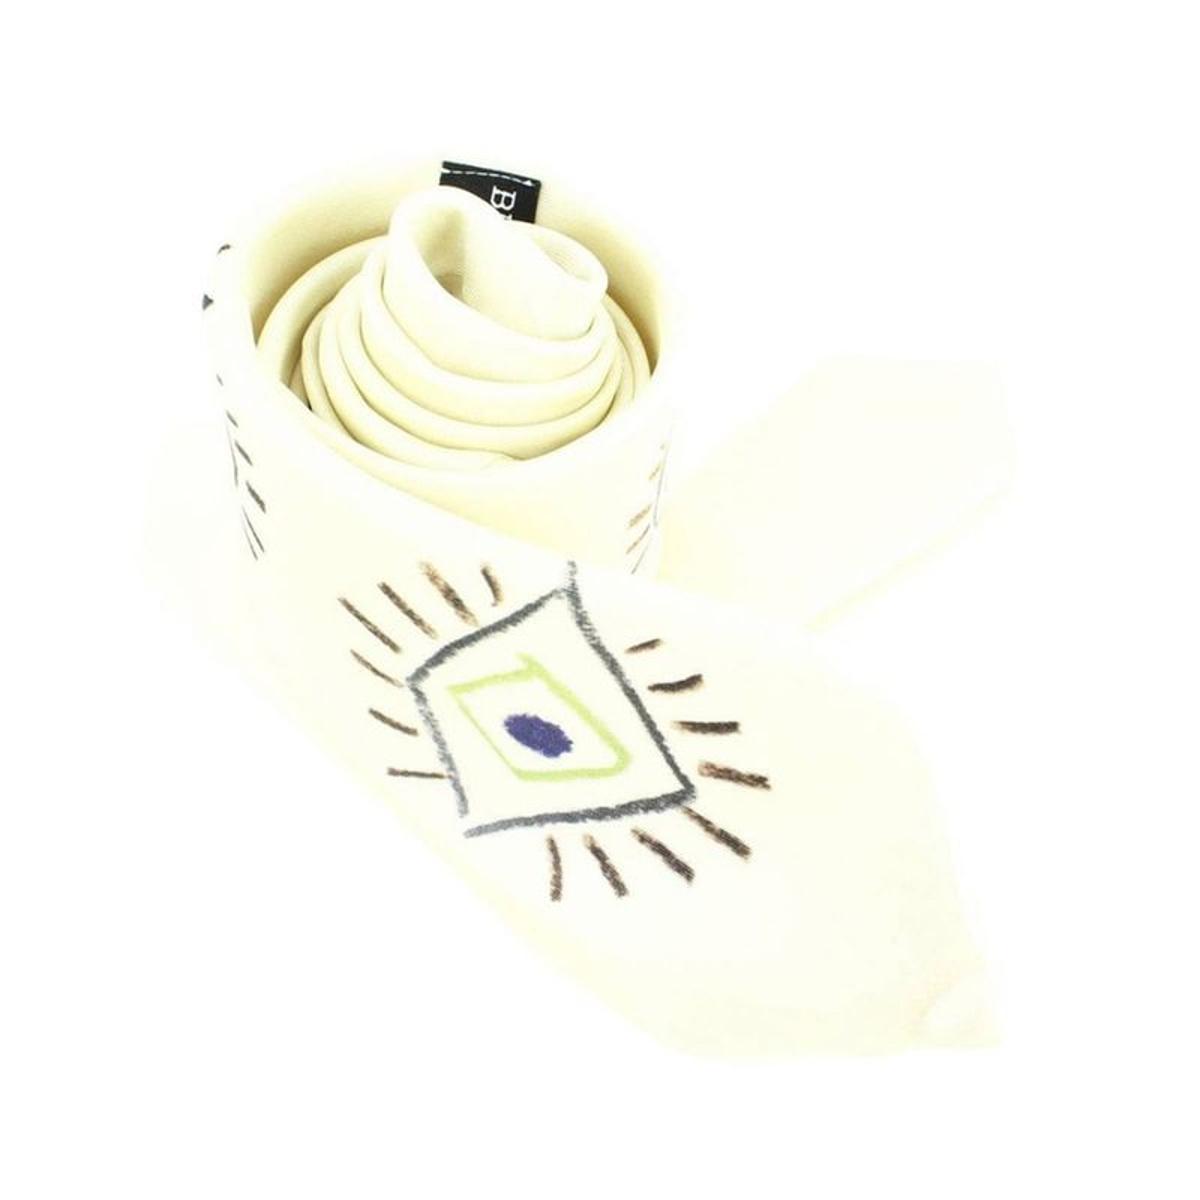 Cravate Lyonnaise  en soie  PICASSO  OEIL, Made in France